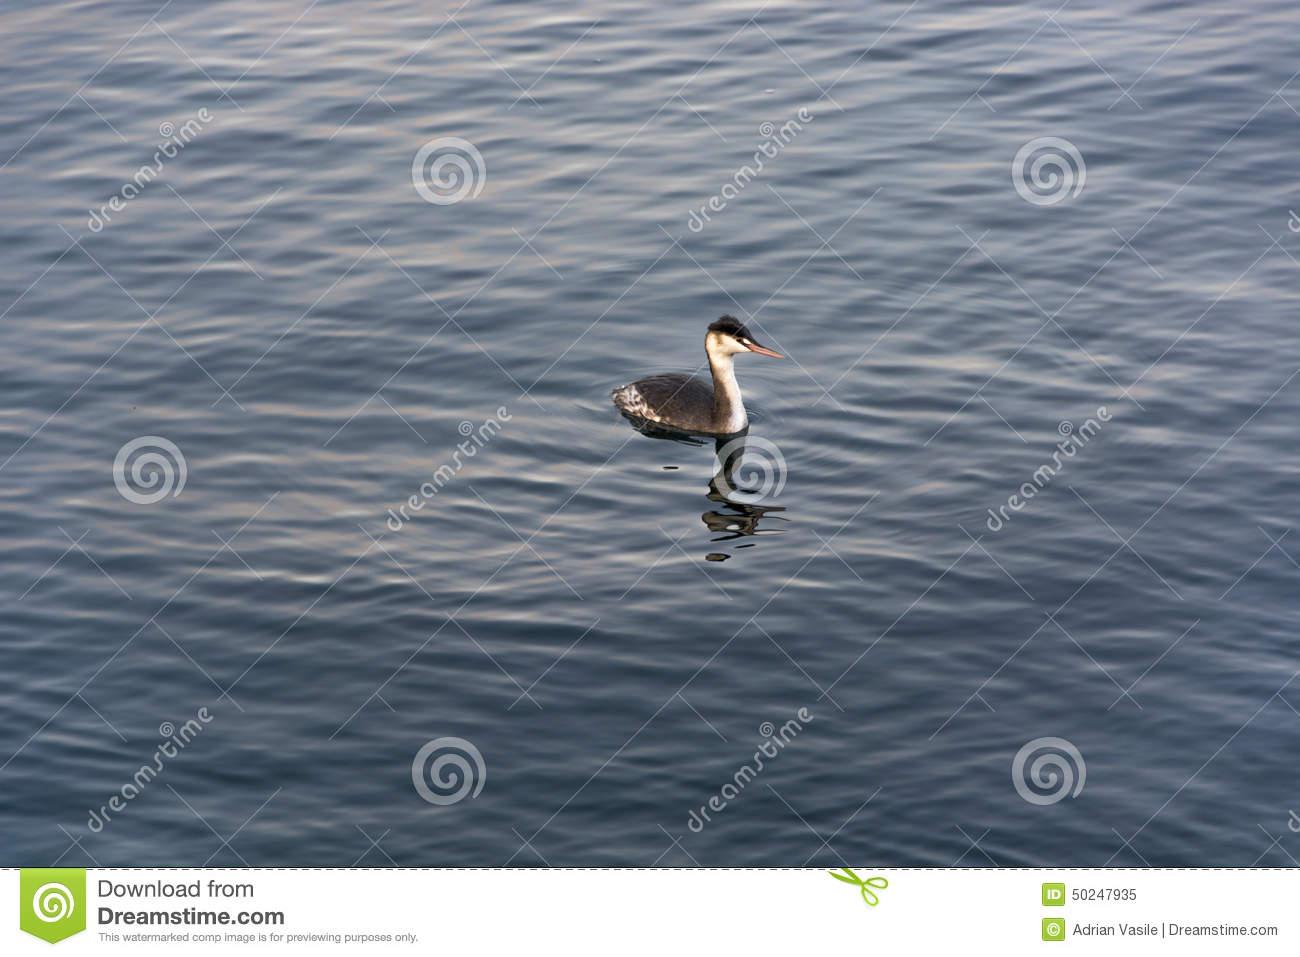 Grebe Fresh Water Diving Bird. Outdoor Shot Using Natural Light.